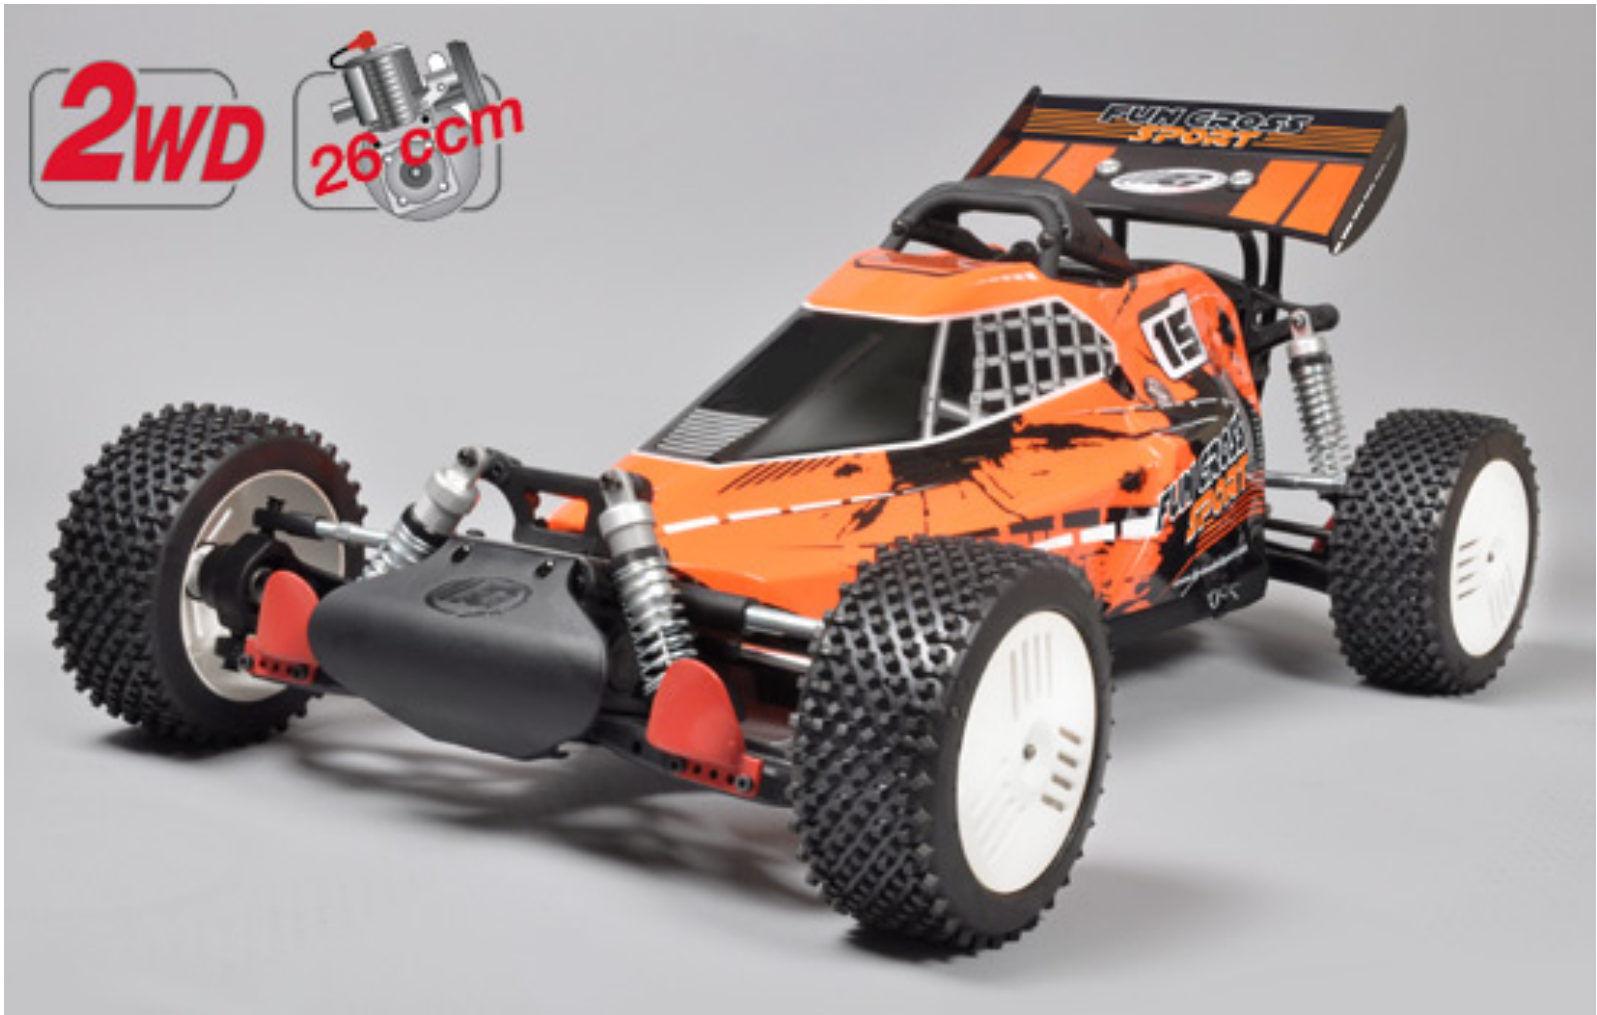 FG Modellsport  670070 gröschl DIVERTIUomoTO CROSS SPORT 2WD 26 CCM